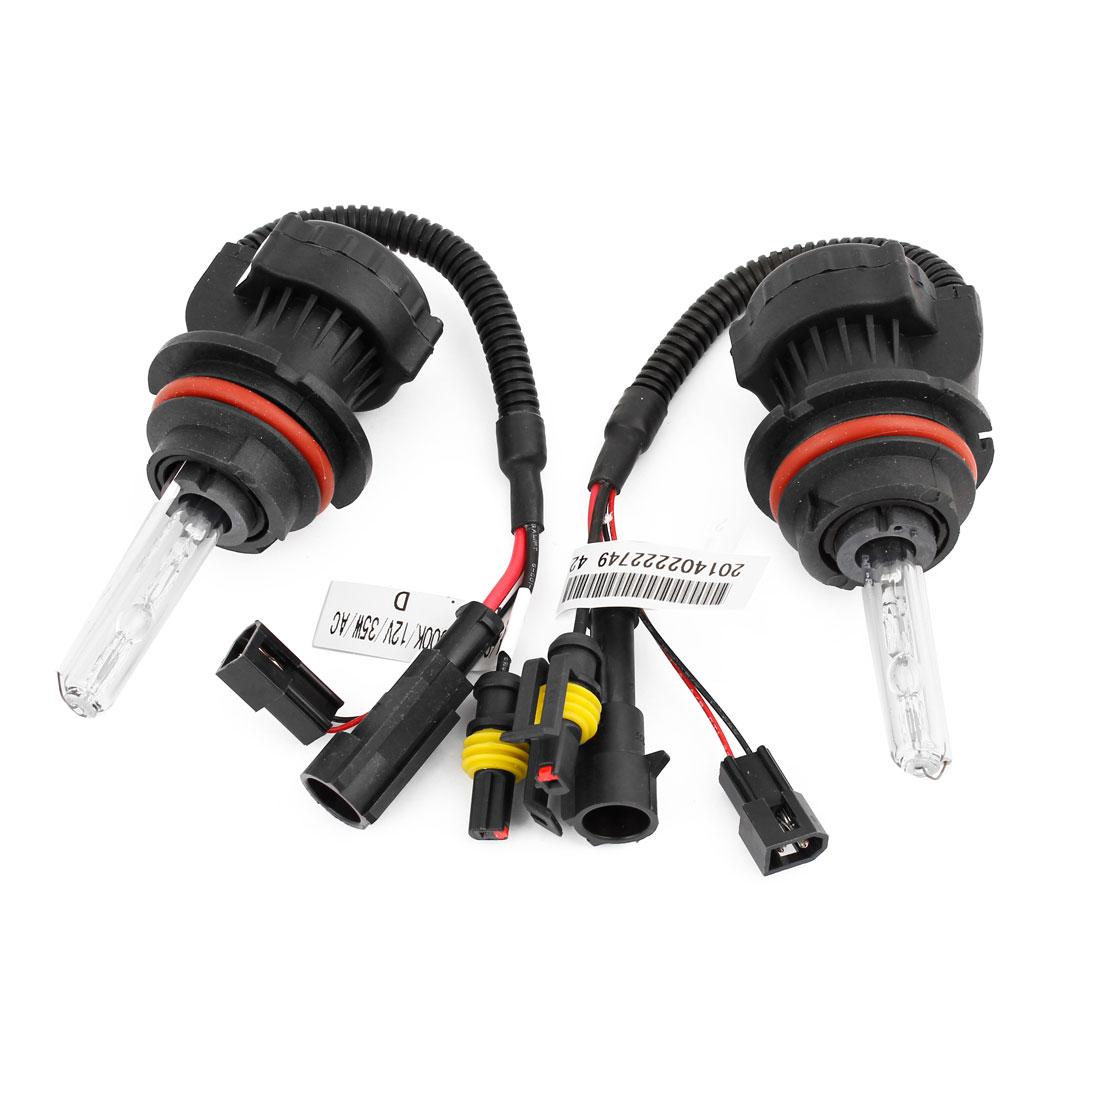 2 x 35W 6000K Car Auto HID 9004 9007 Headlight Lamp w Wiring Harness Controller